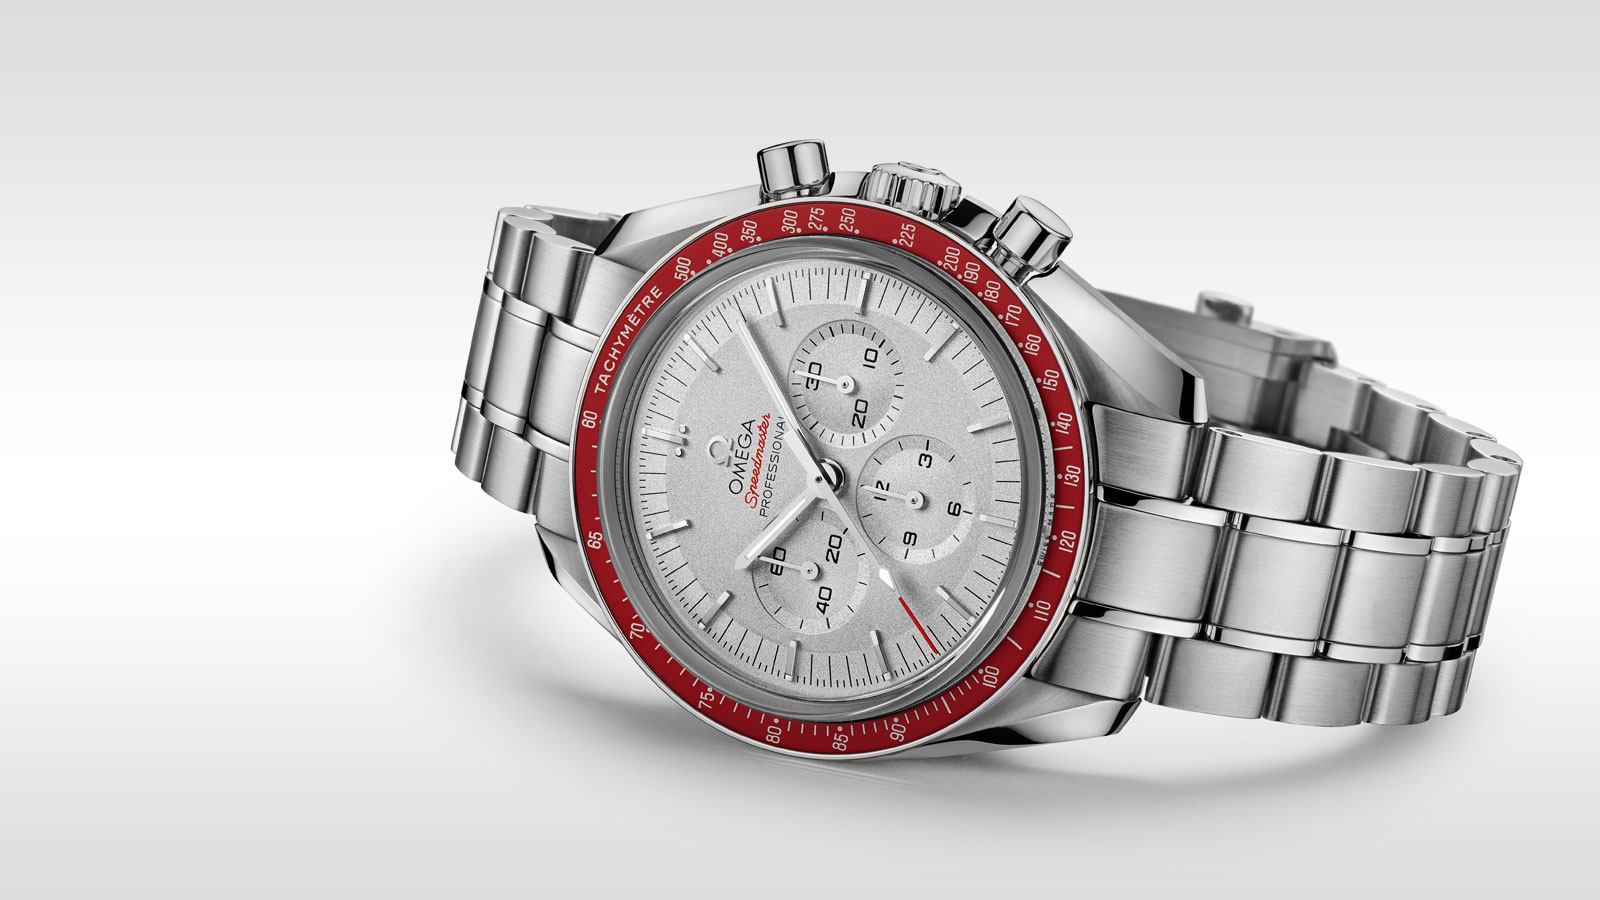 đồng hồ Speedmaster Professional Tokyo 2020 (ref. 522.30.42.30.06.001)